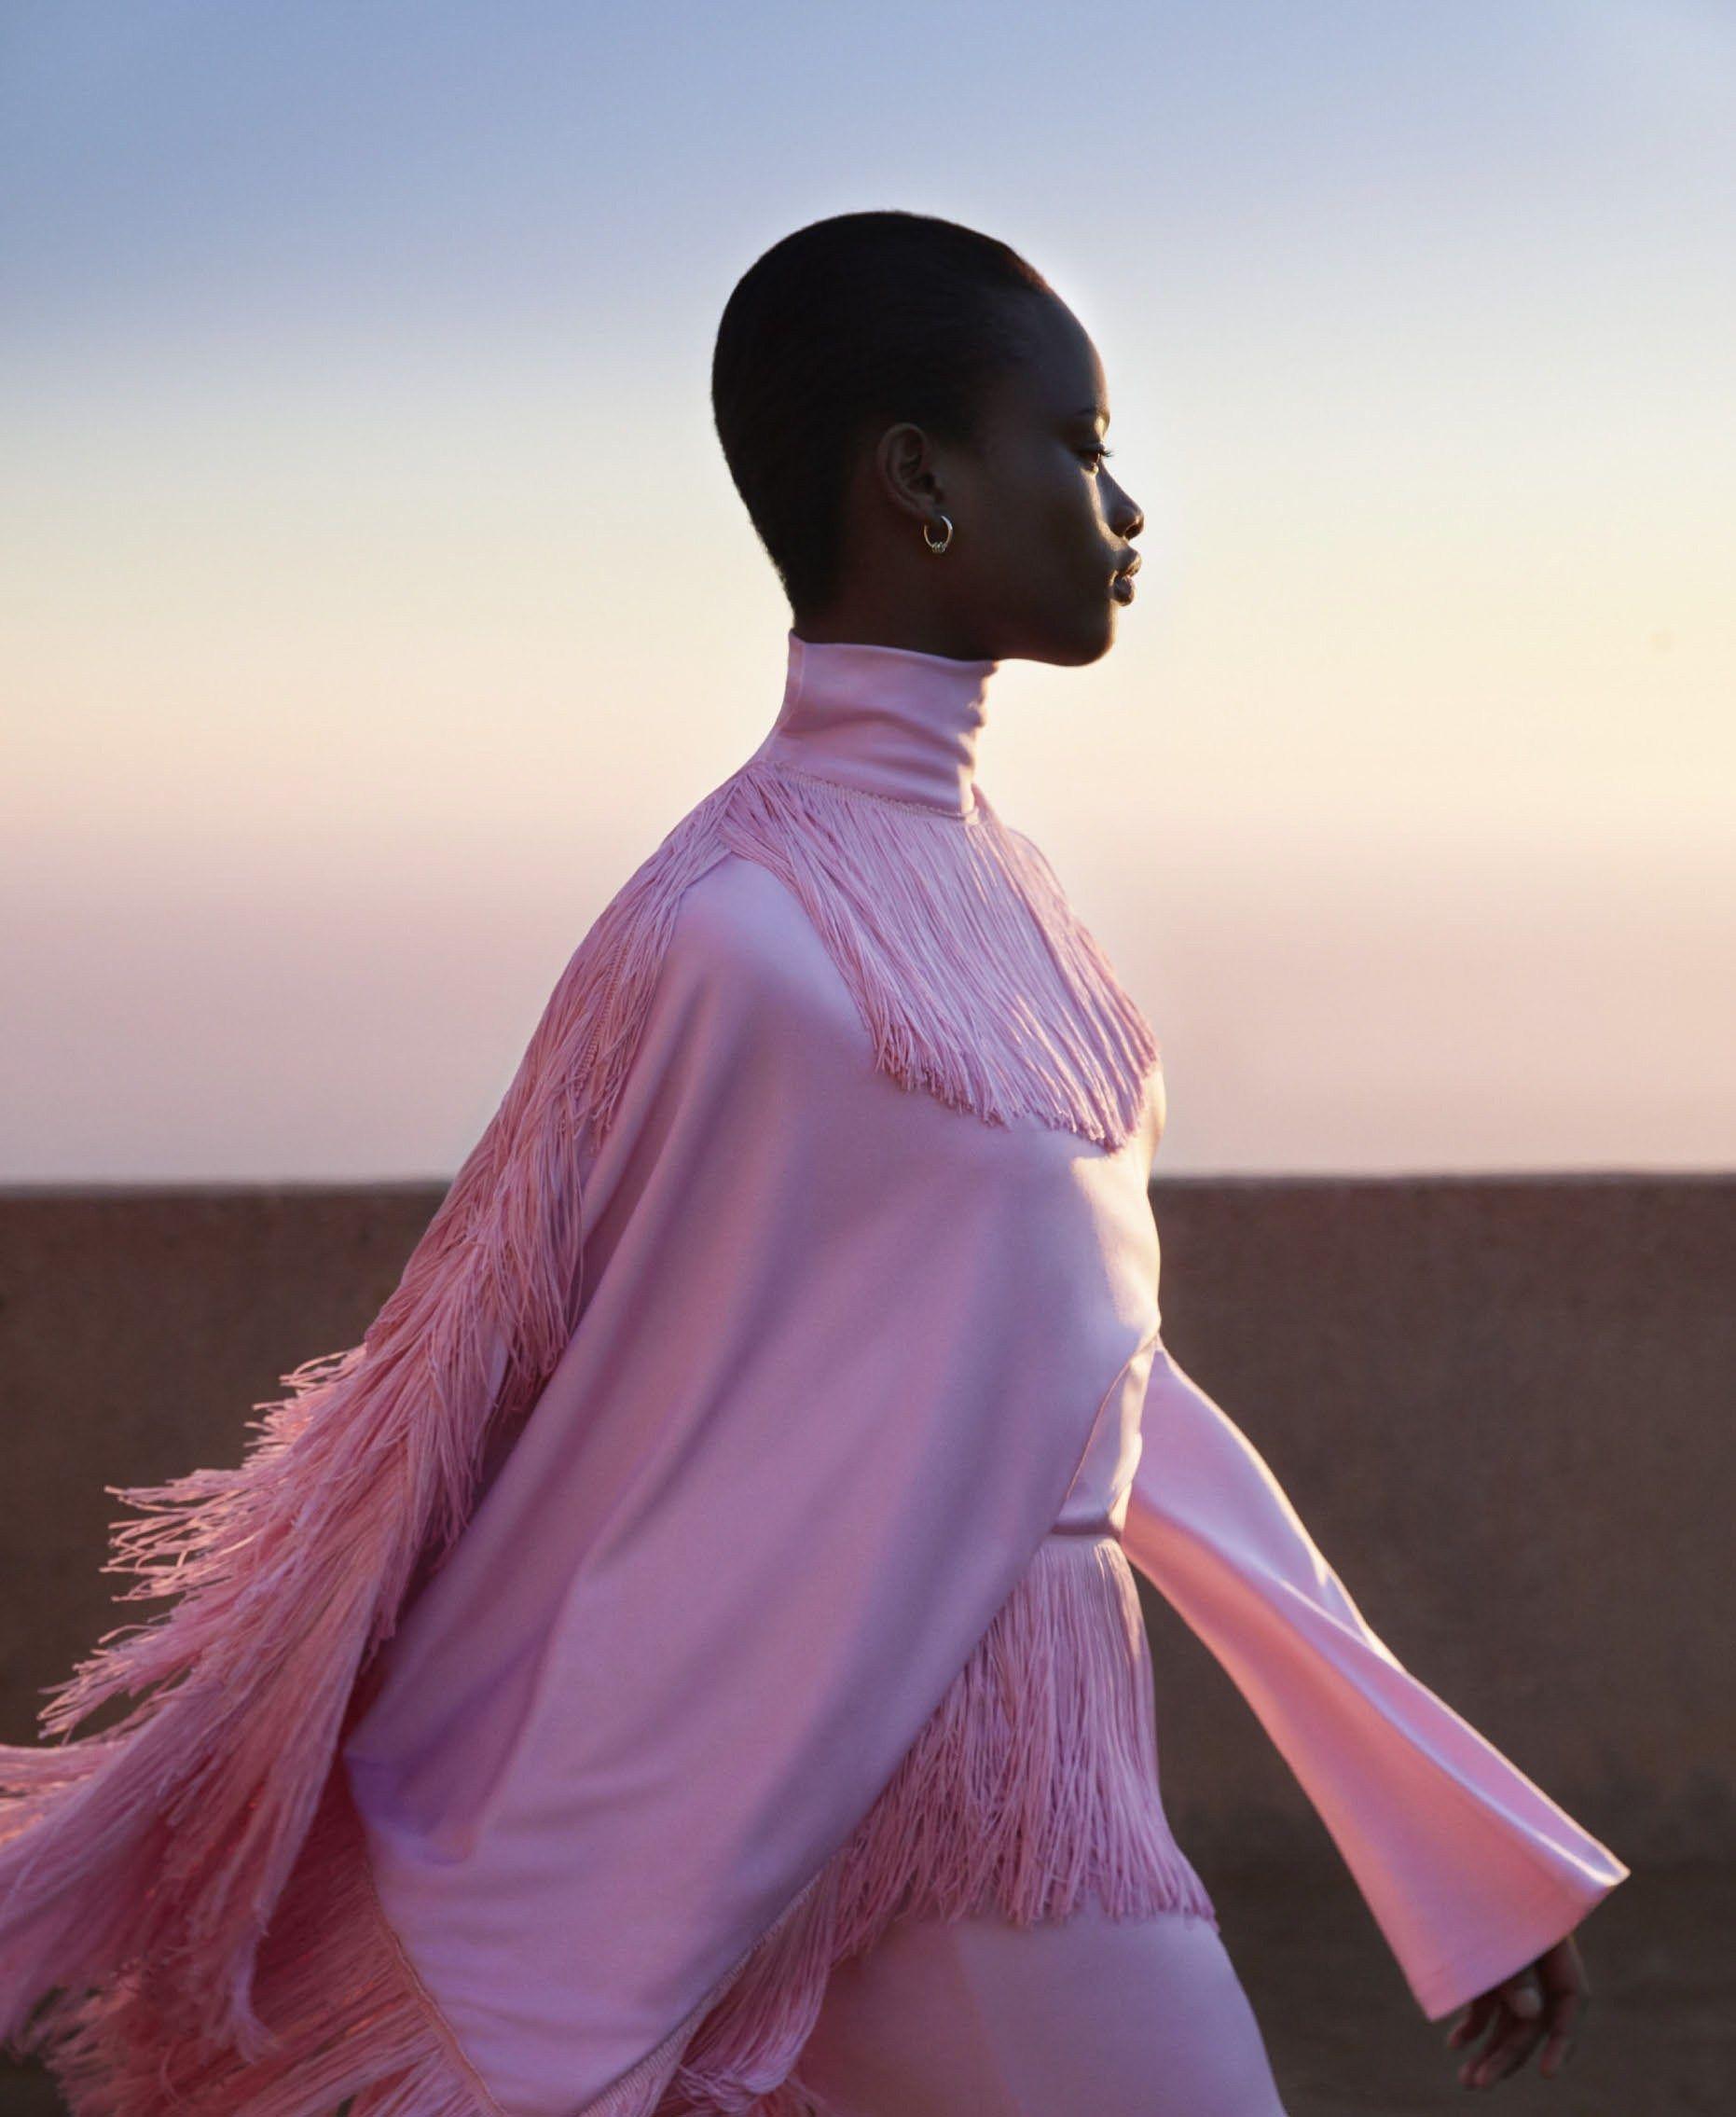 Mayowa Nicholas by Camilla Åkrans for Harper's Bazaar US February 2017